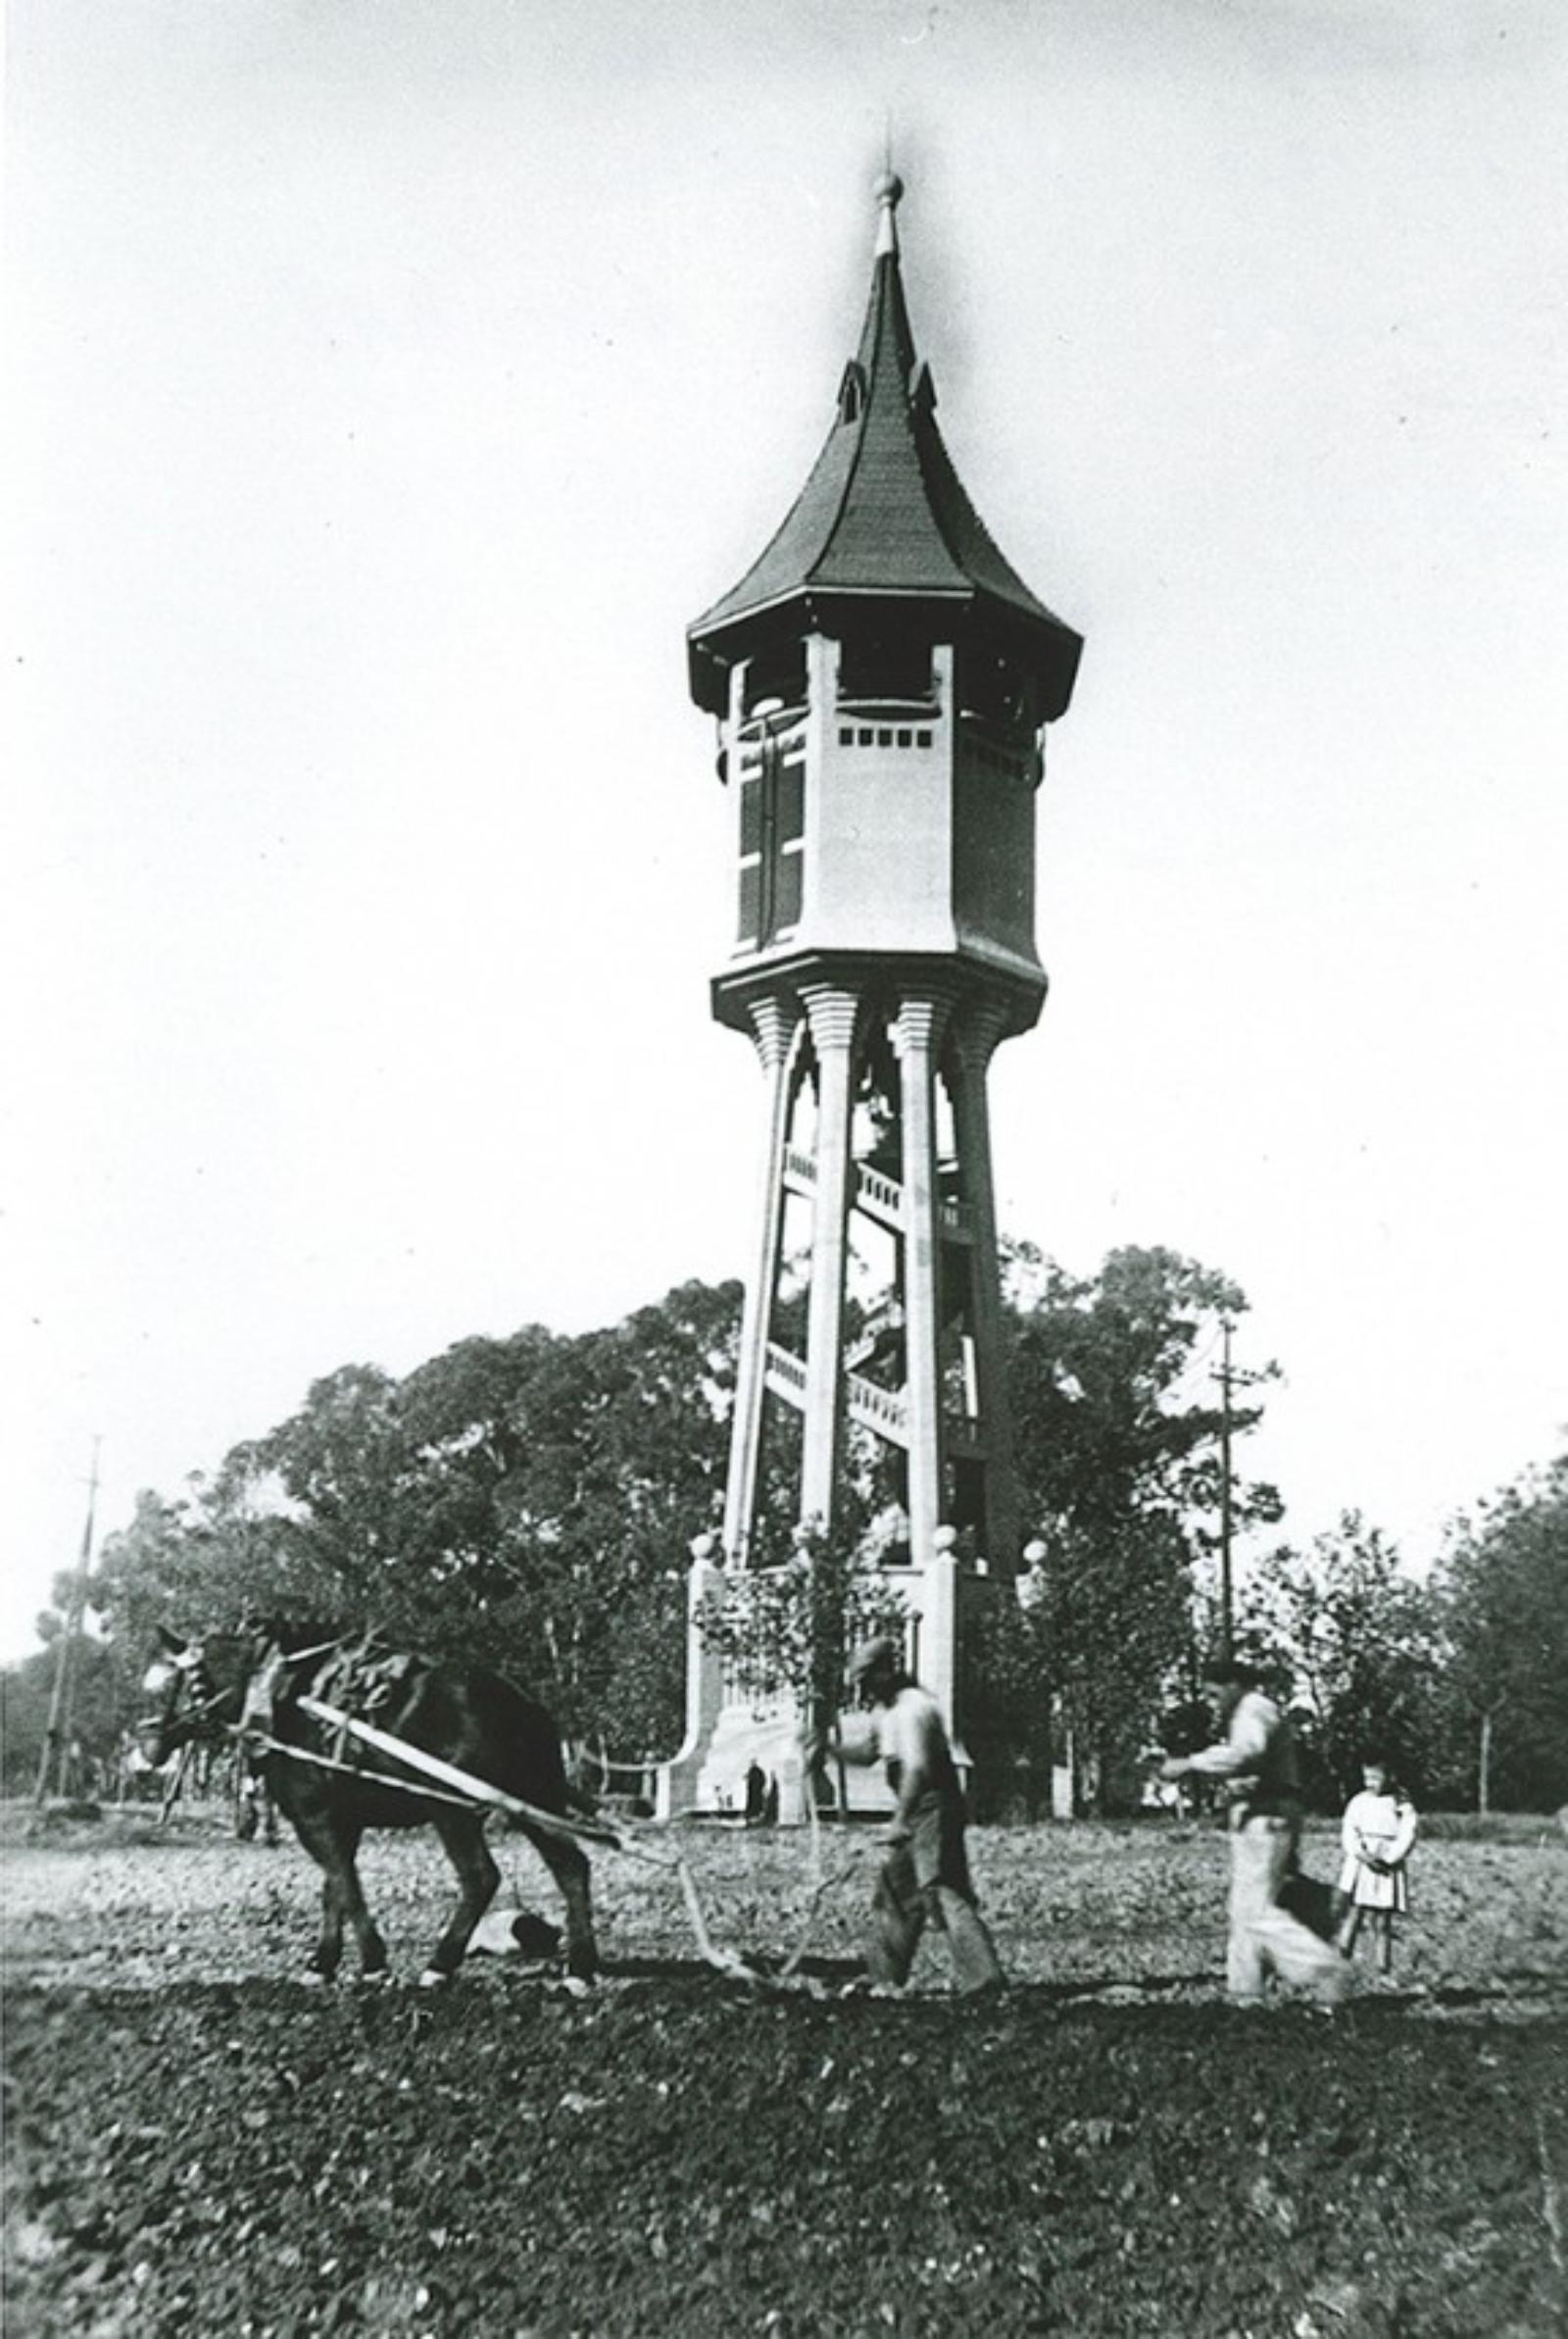 Torre de l'Aigua, 100 years